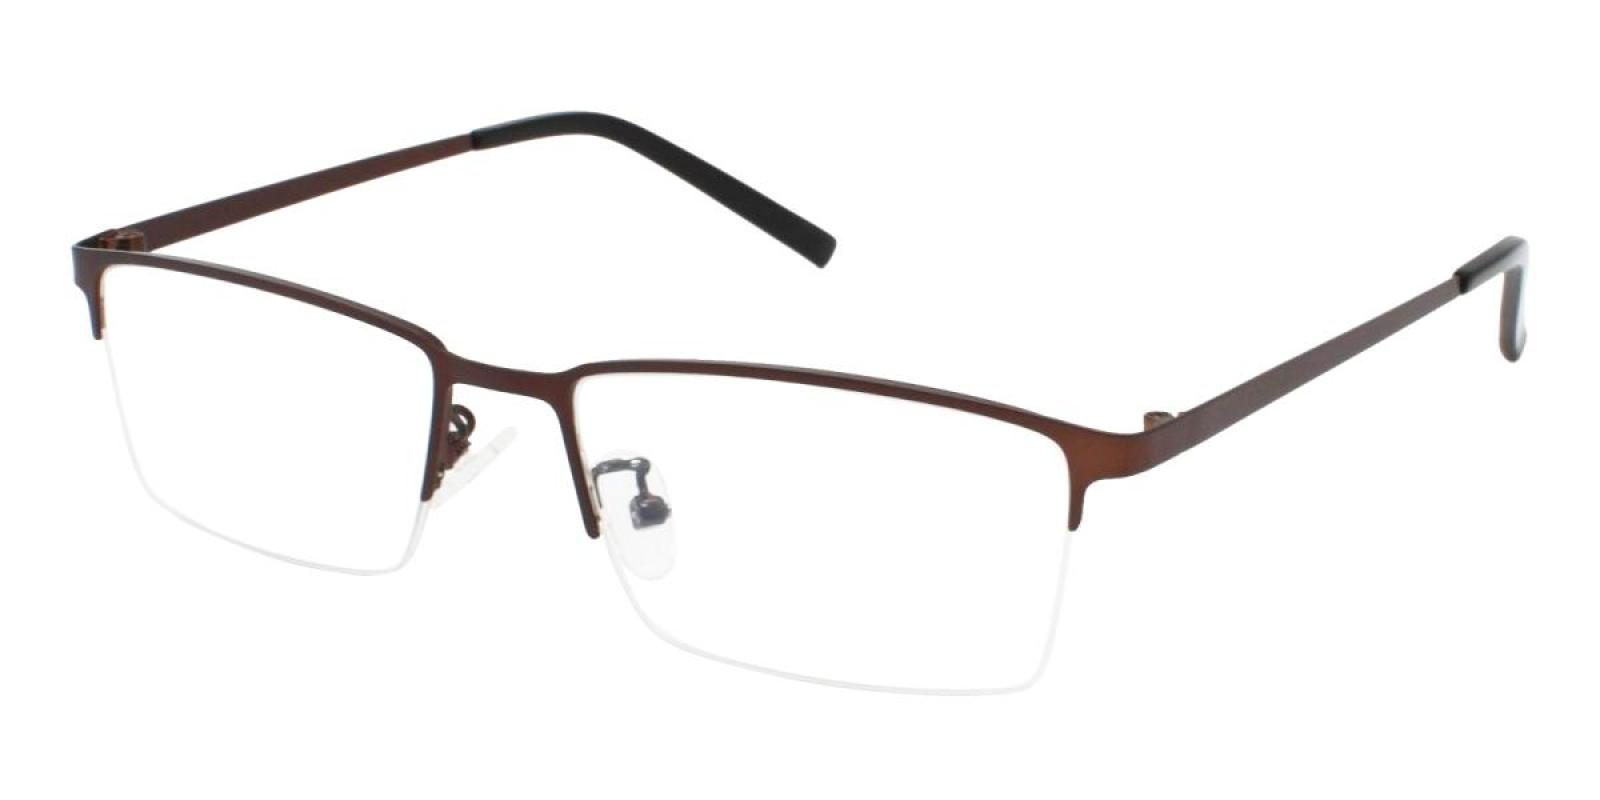 Bezel-Brown-Rectangle-Metal-Eyeglasses-detail